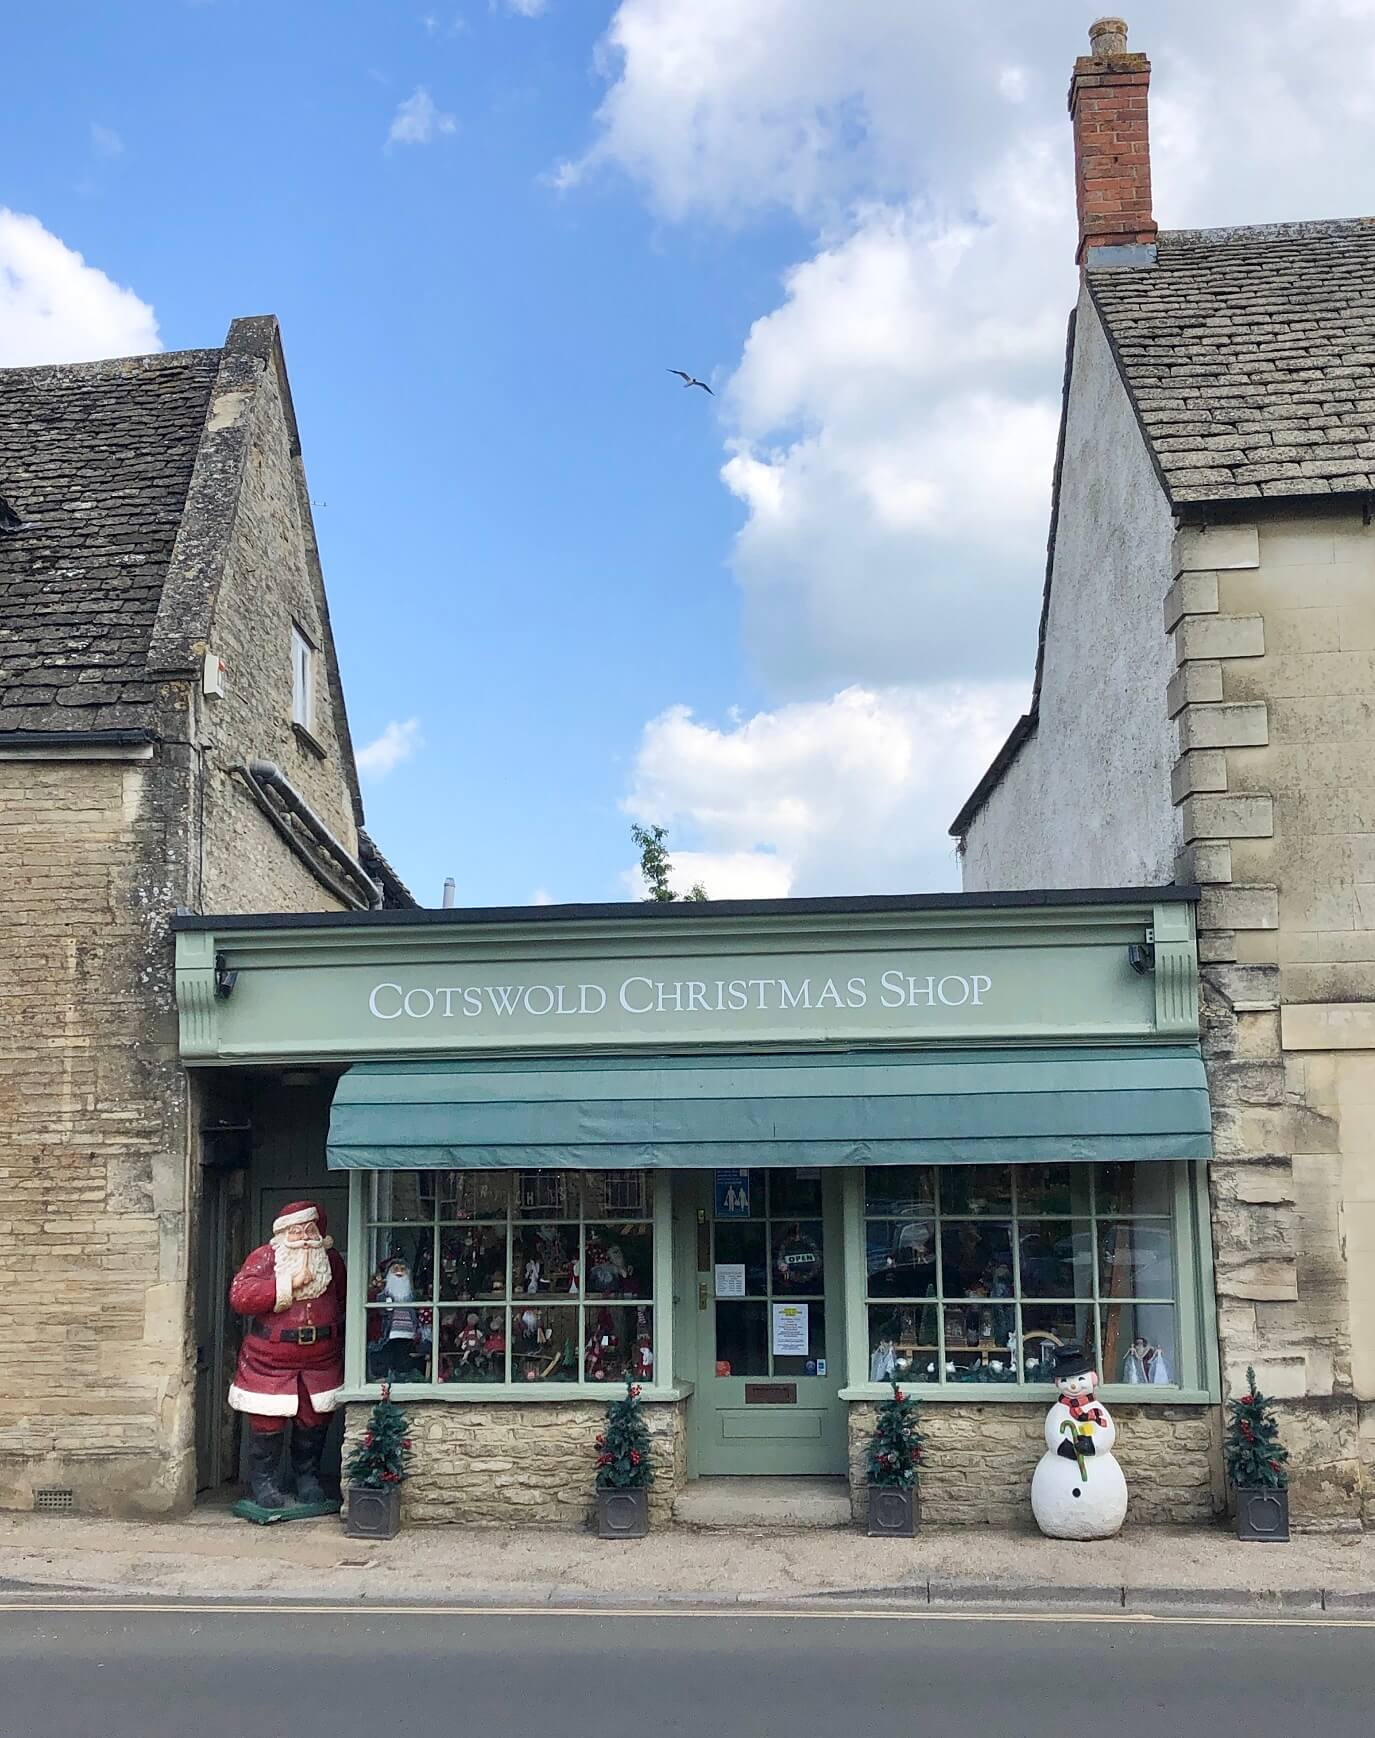 Cotswold Christmas Shop Front